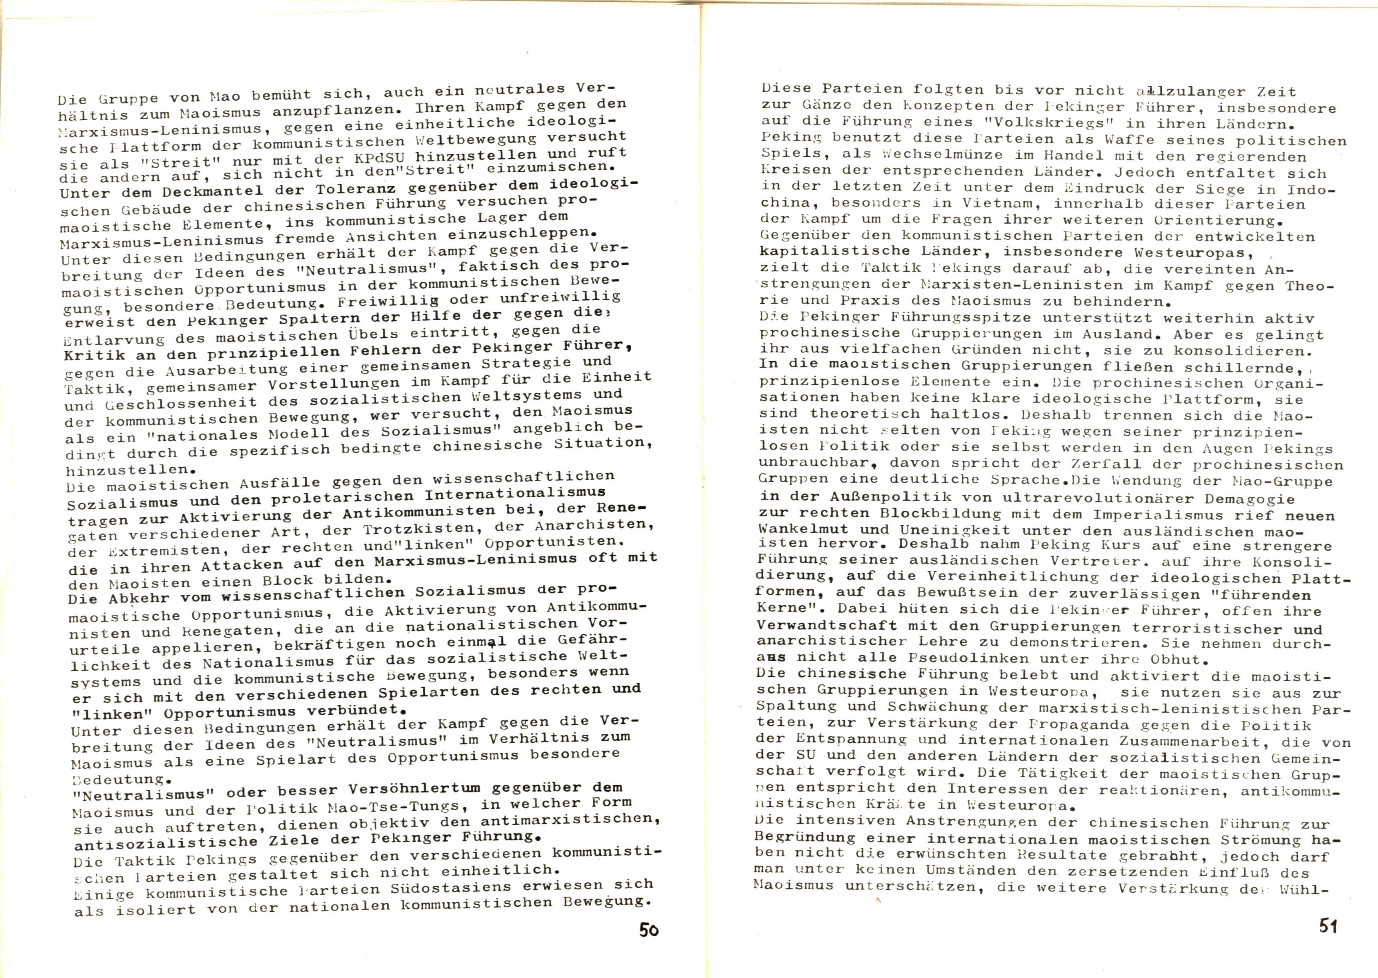 Berlin_KSV_1975_Dokumente_der_SAZ_27